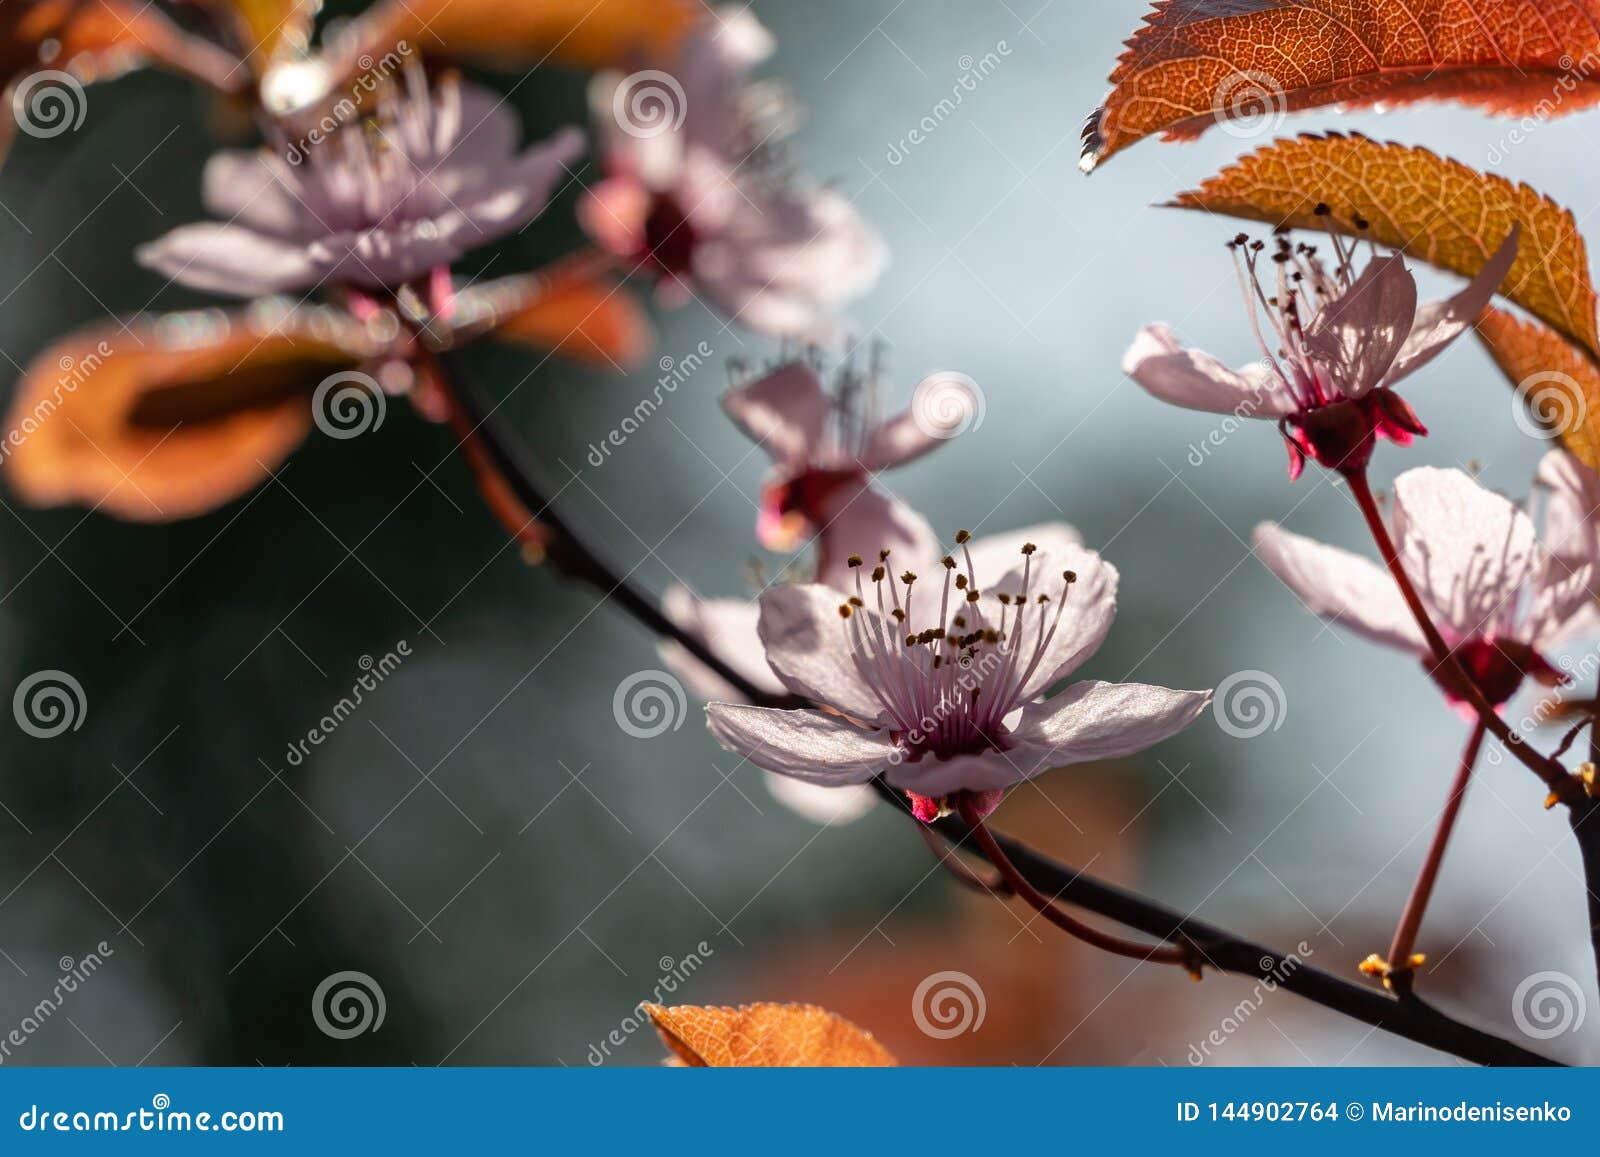 Prunus Cerasifera Pissardii Tree blossom with pink flowers. Spring twig of Cherry, Prunus cerasus on  beautiful blurred